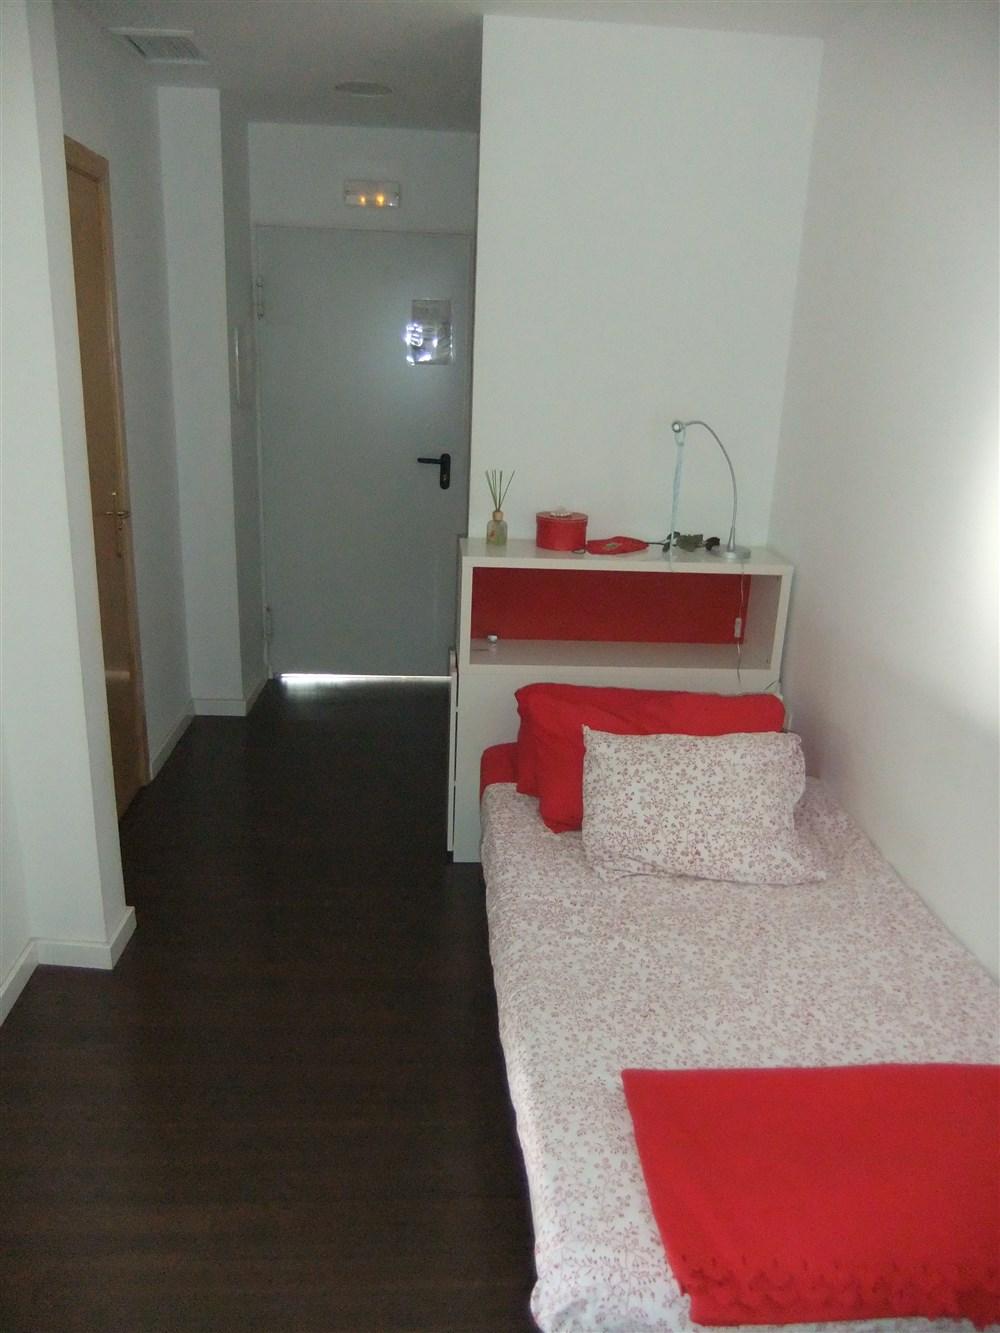 Hostal Residencia Goya, Zaragoza   Guest B&B - Book Now